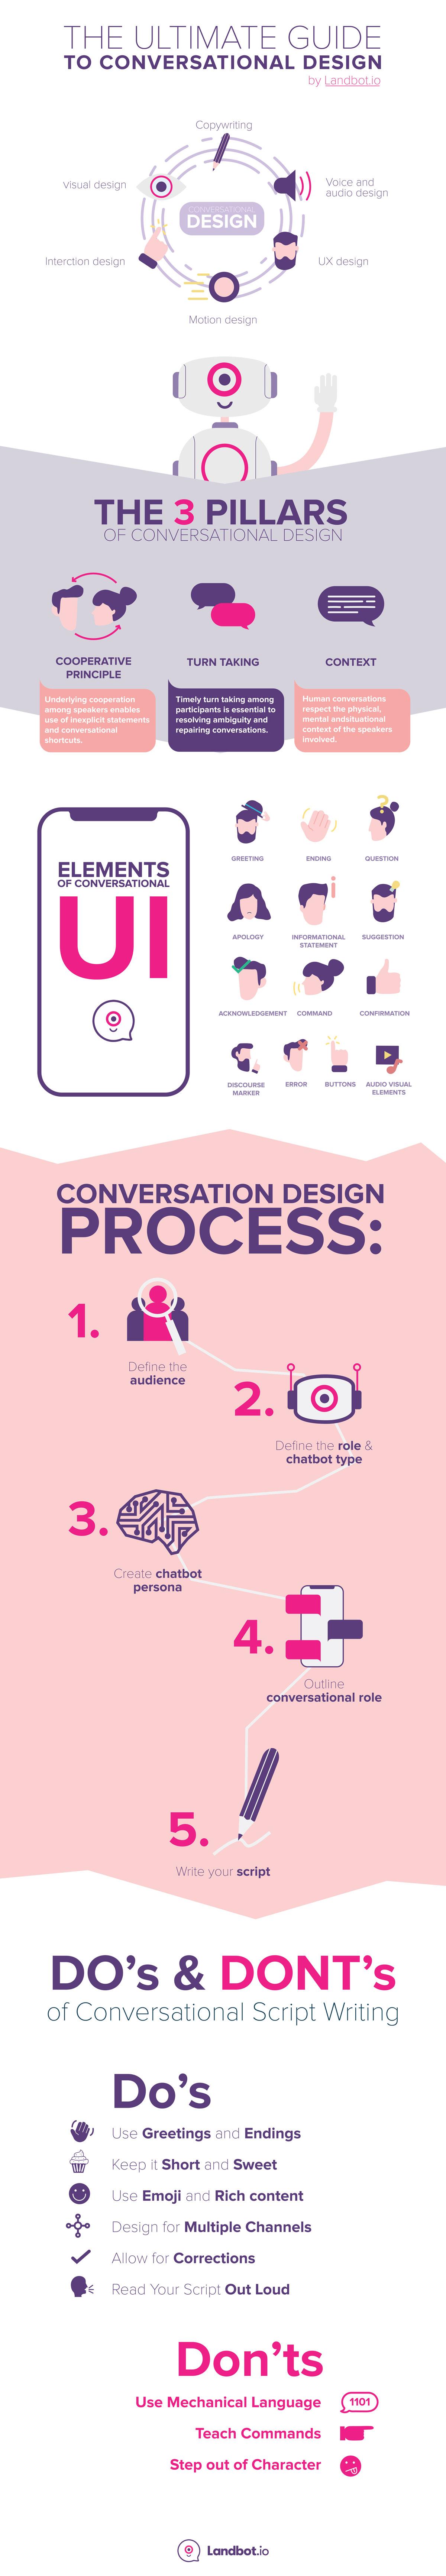 guia-diseño-conversacional-infografico